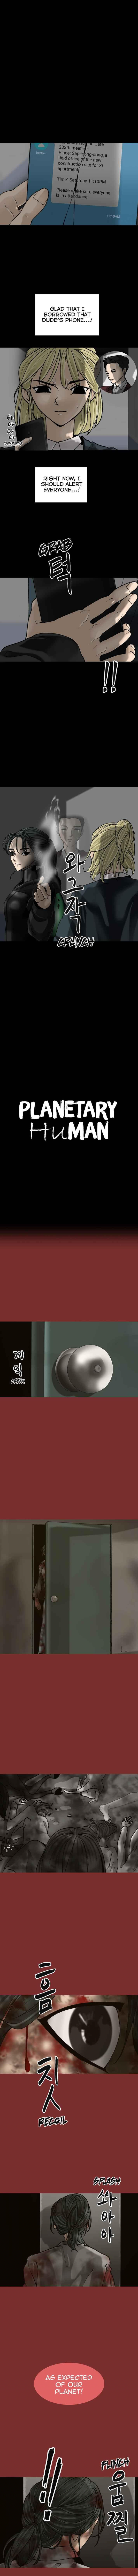 Planetary Human - chapter 52-eng-li